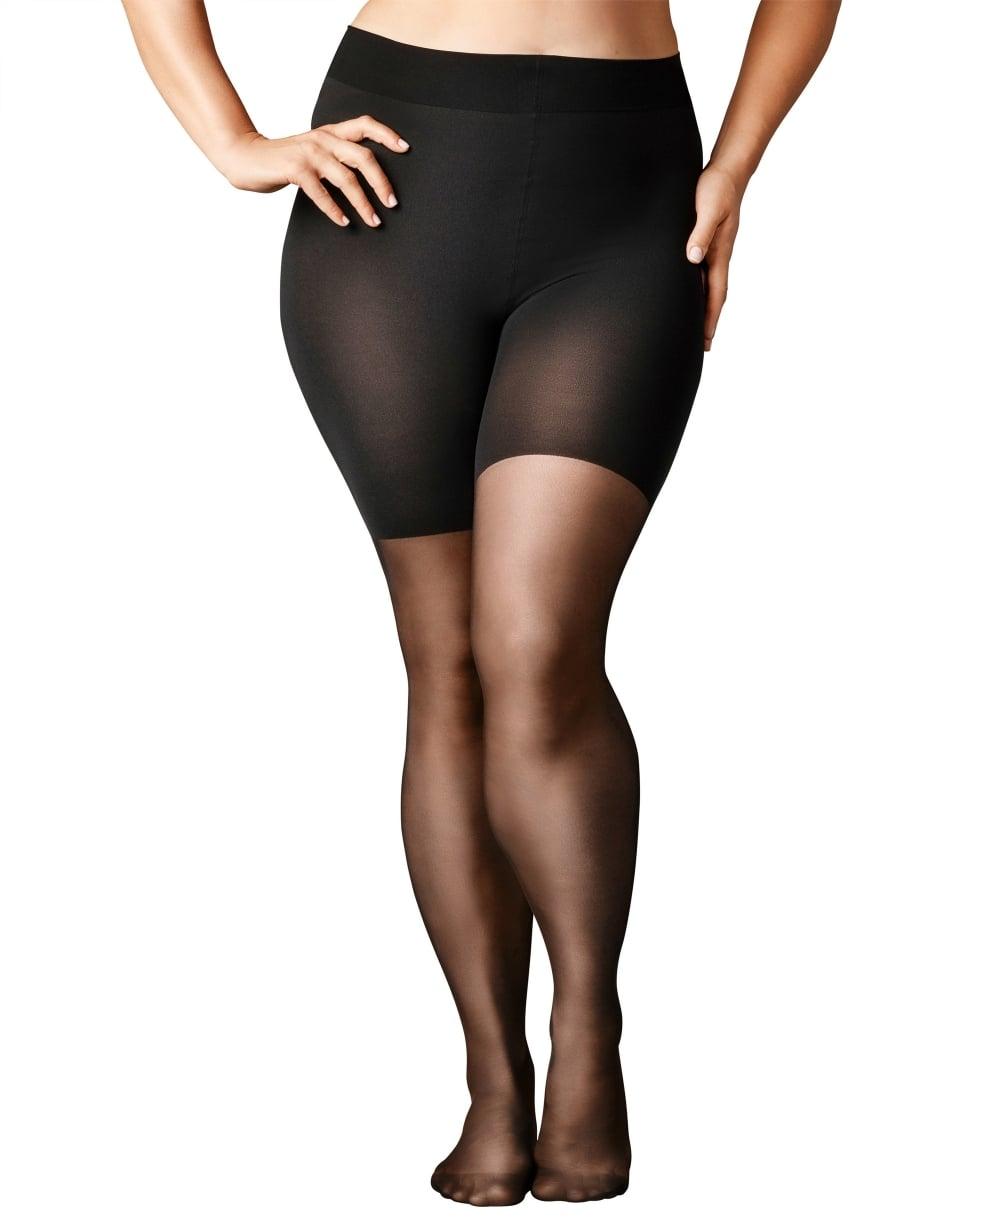 06b92ccf135 Falke Beauty Plus 20 Denier Tights - Tights from luxury-legs.com UK